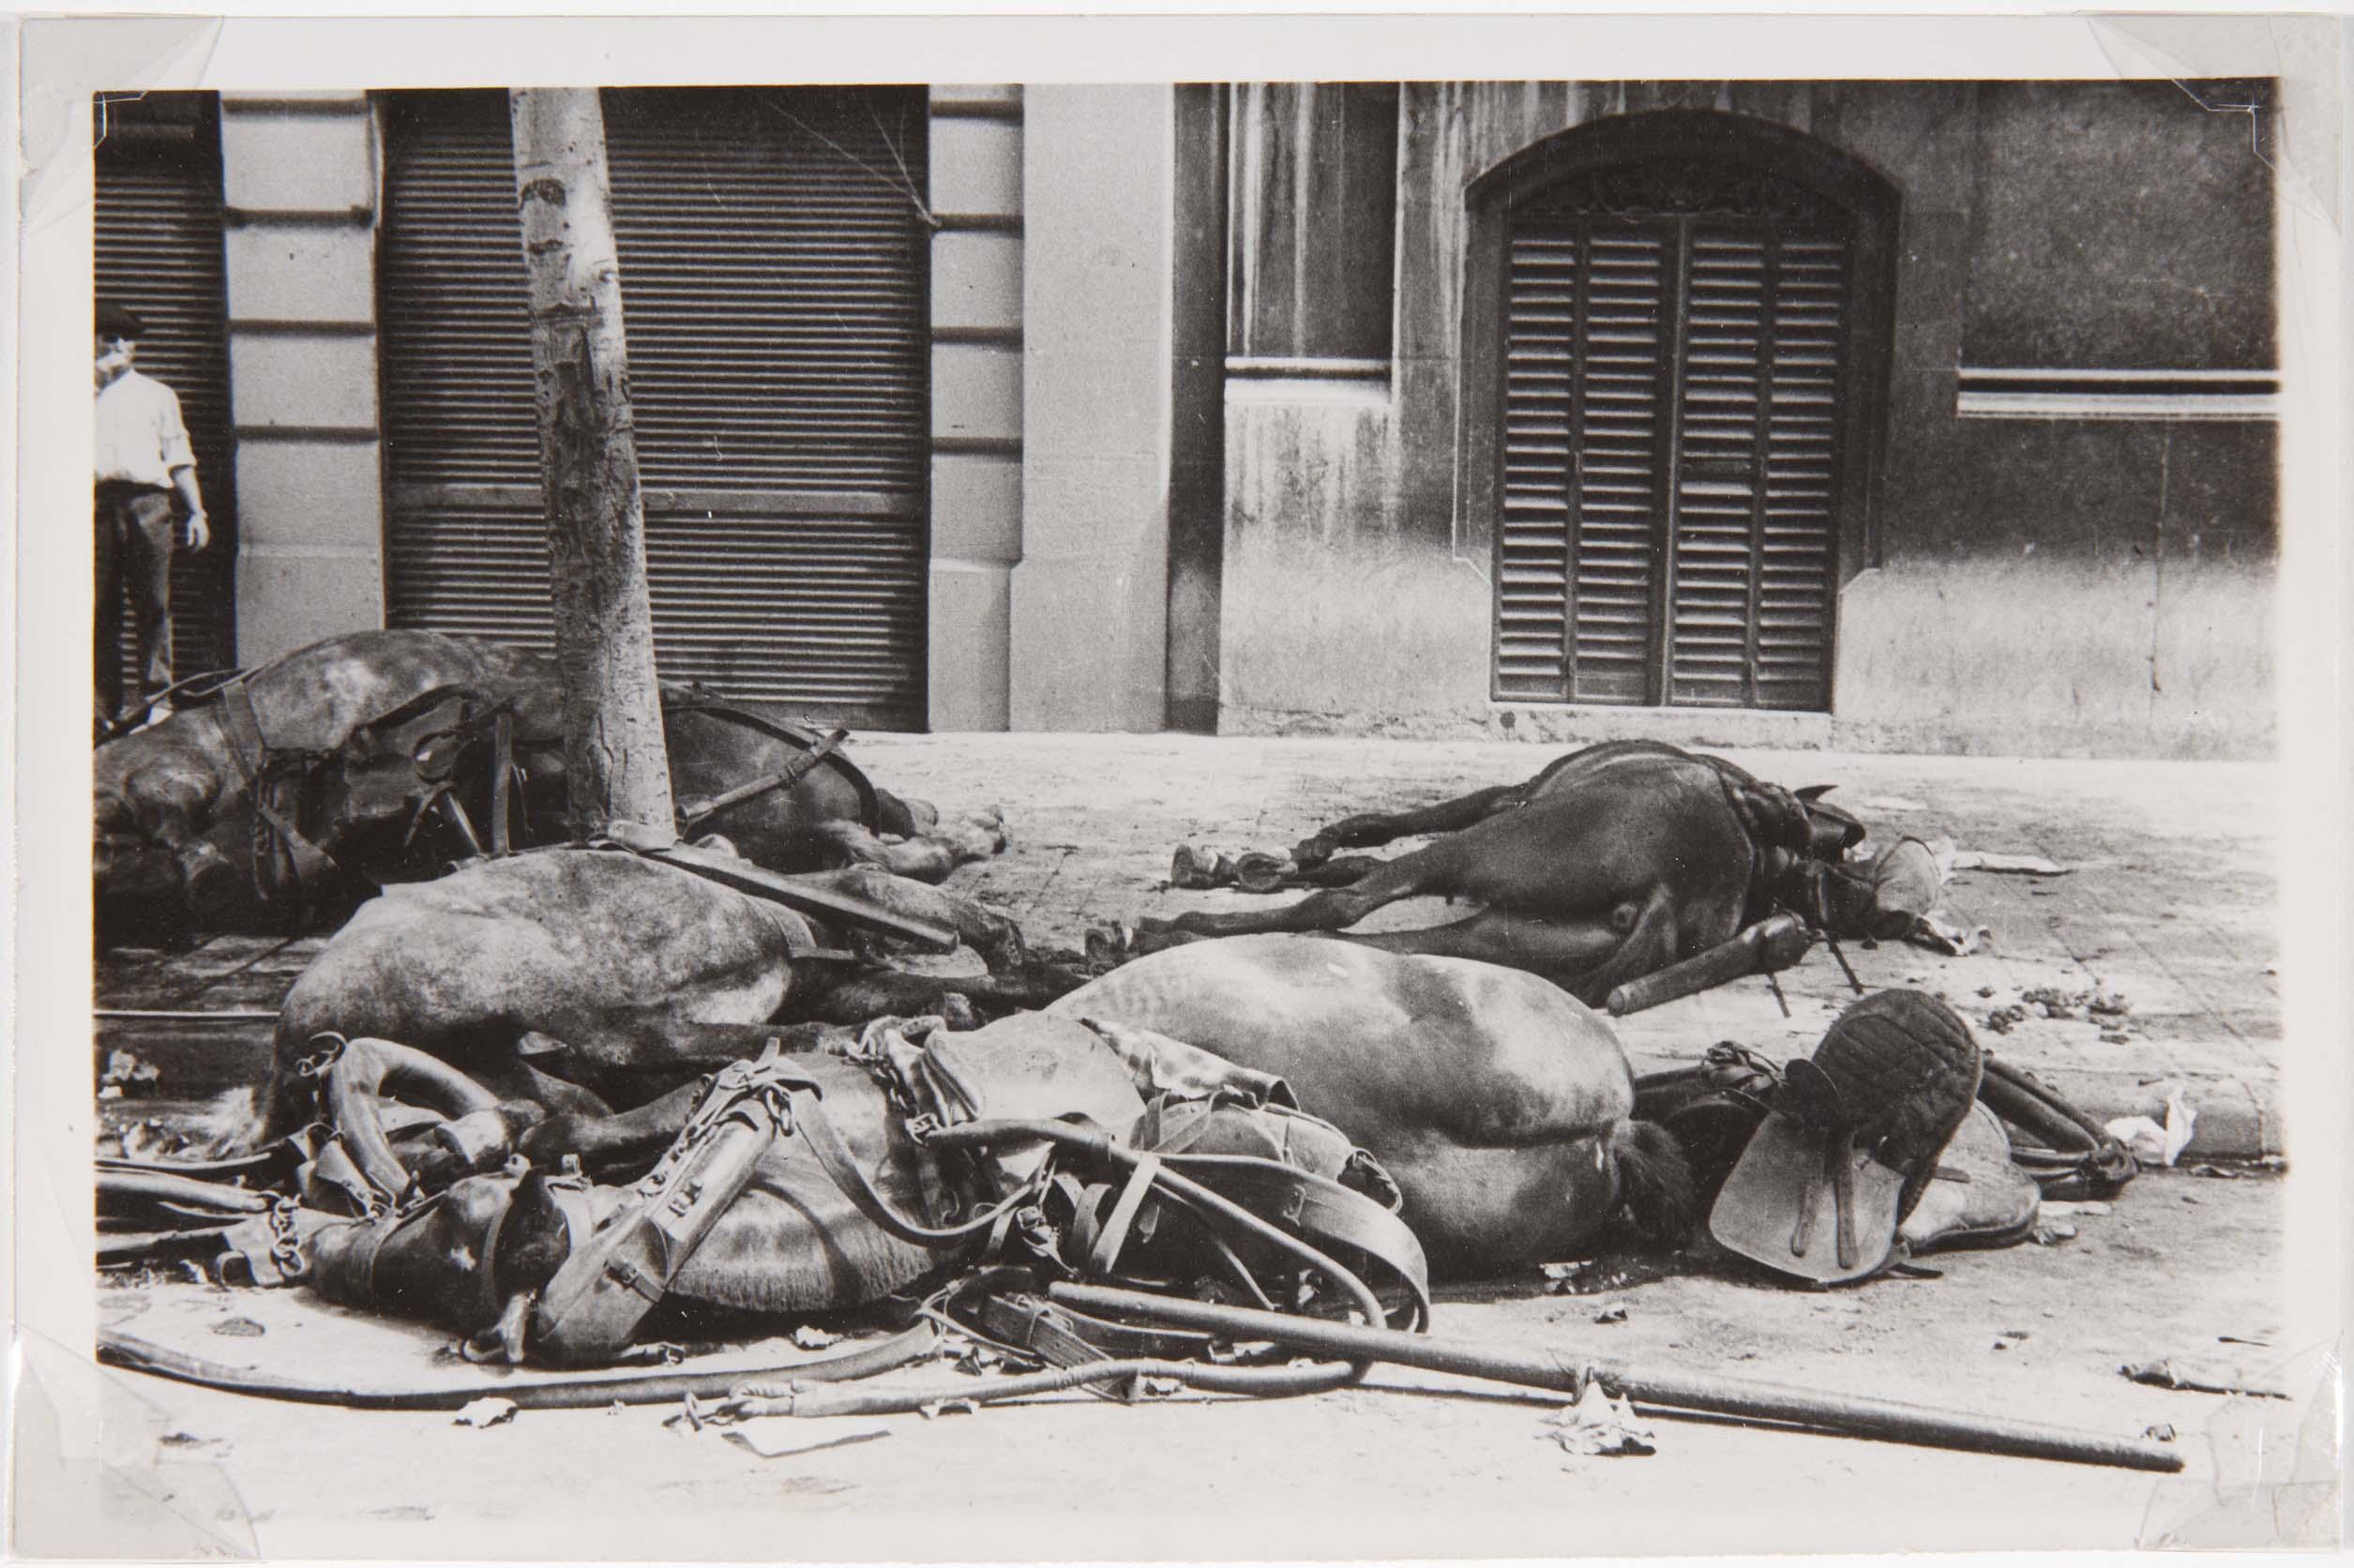 Barcelona, 19 de julio de 1936 (Barcelona, July 19th 1936)